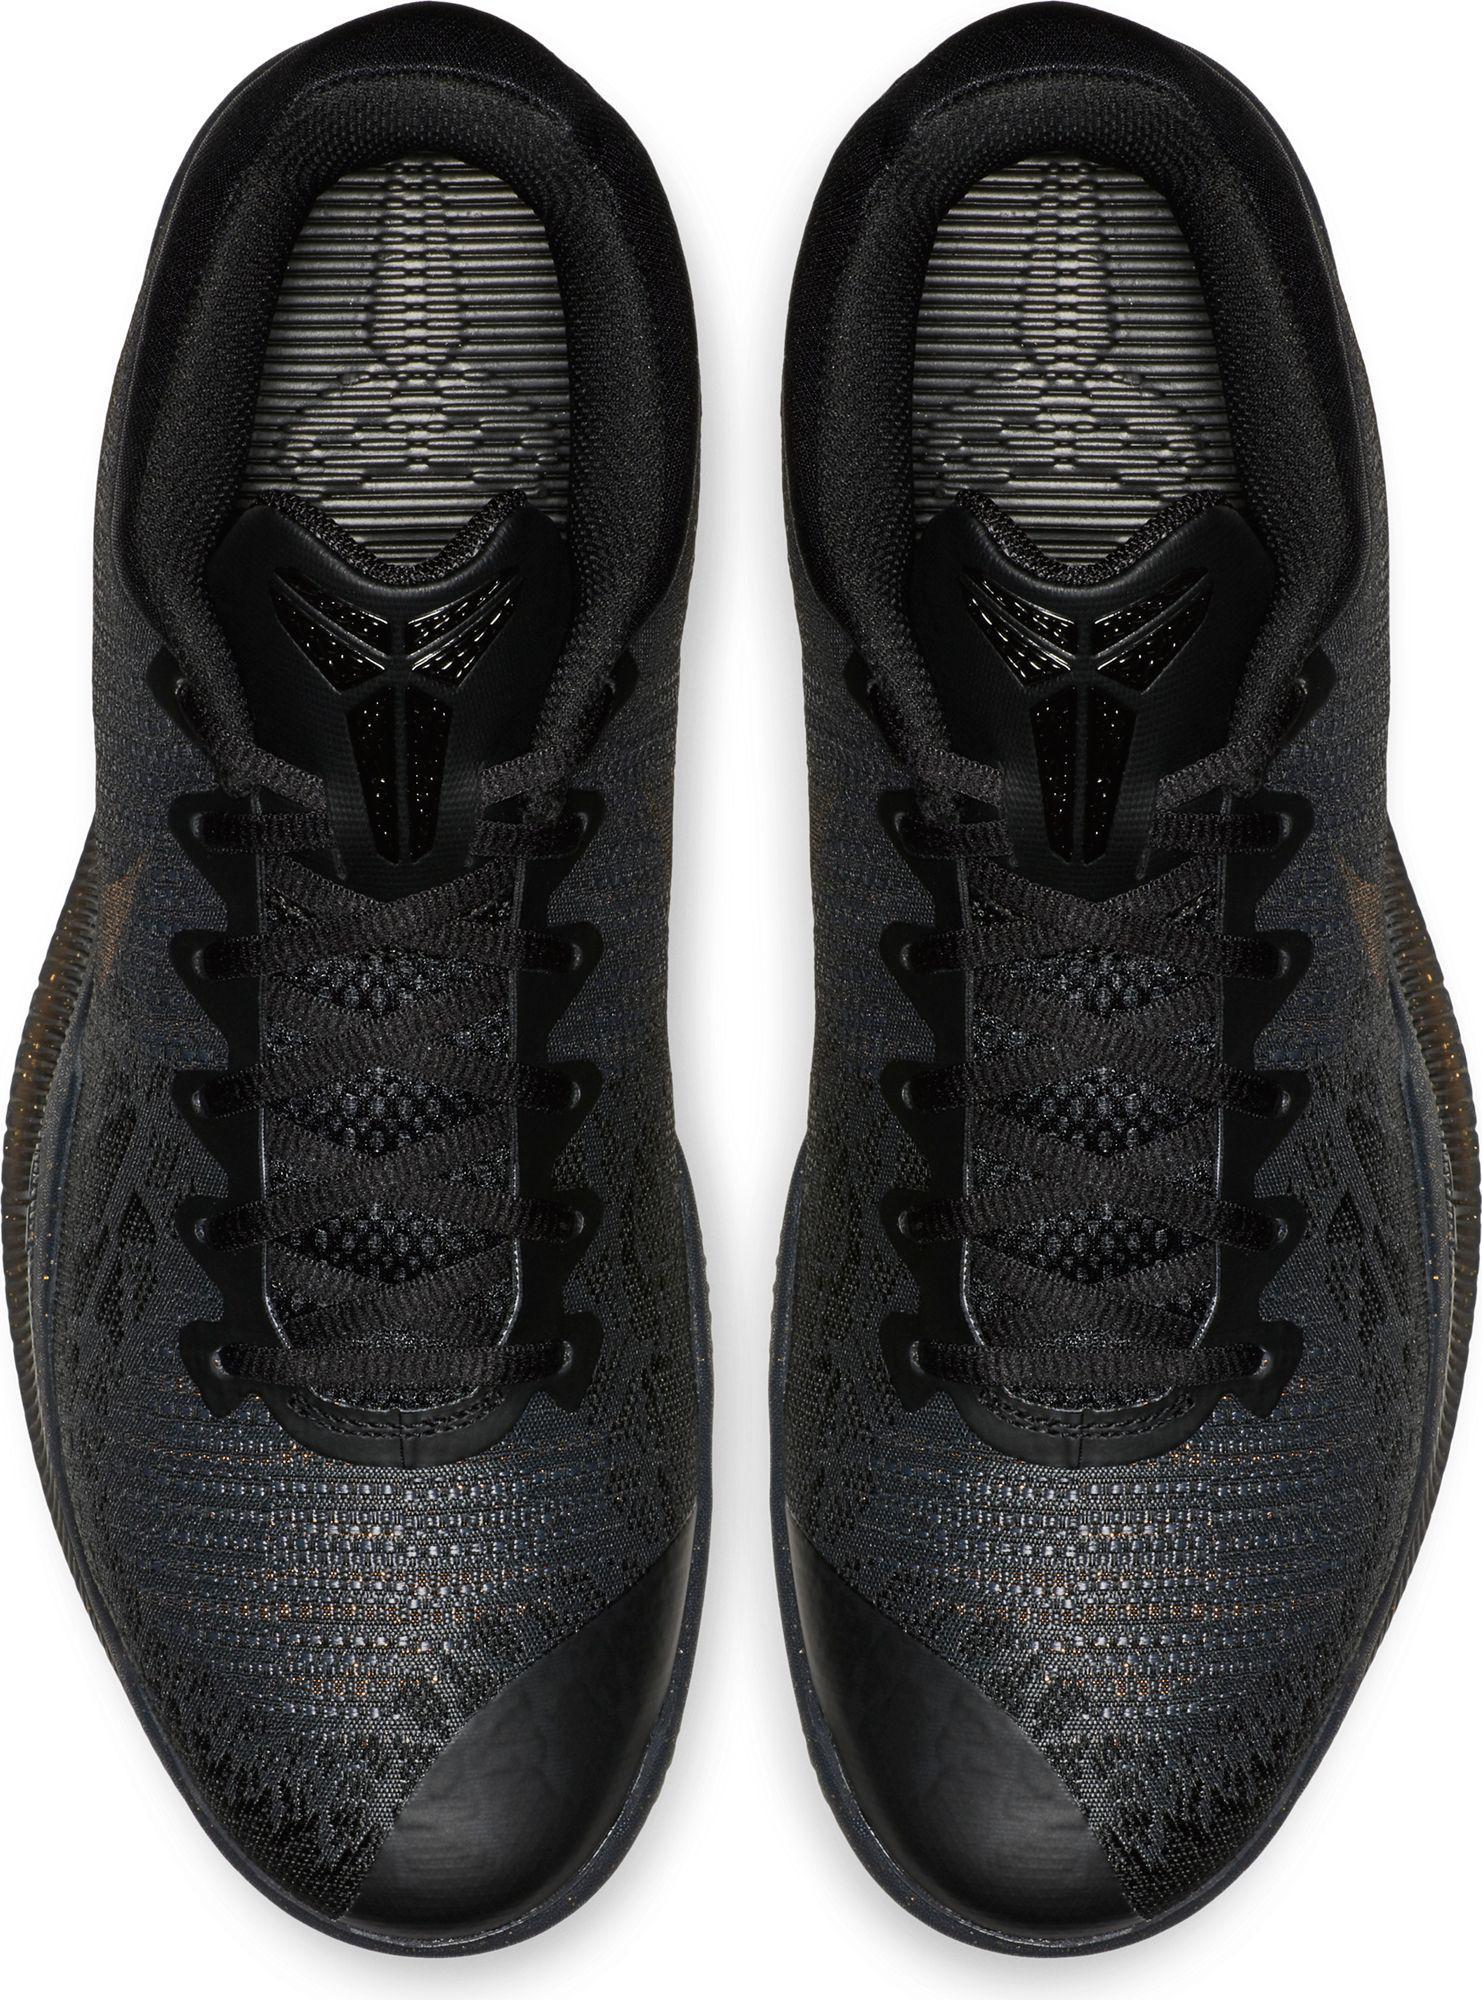 watch 9216f 3851f Lyst - Nike Kobe Mamba Rage Basketball Shoes in Black for Men